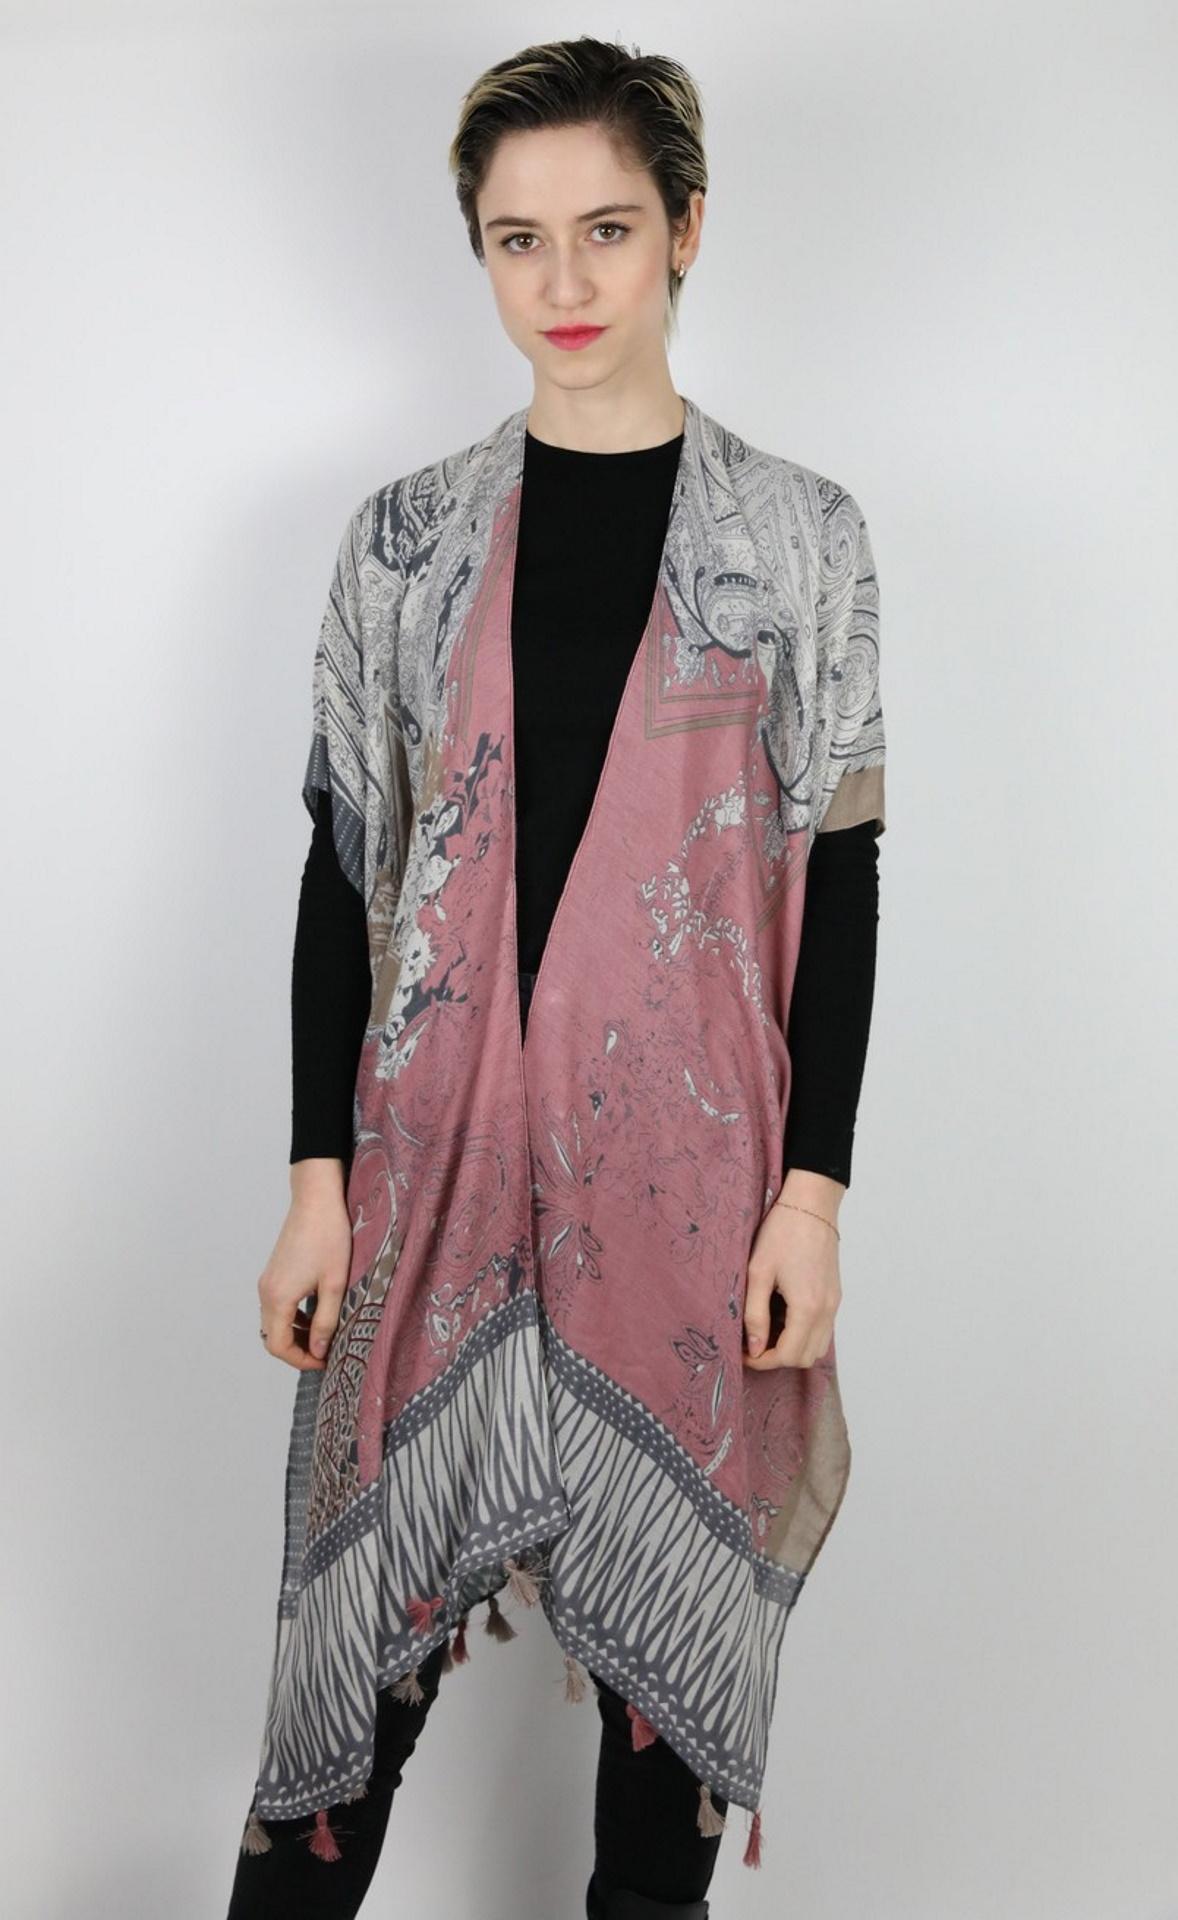 CLOTHES01 STOLA DONNA FOULARD CARDIGAN COPRISPALLE